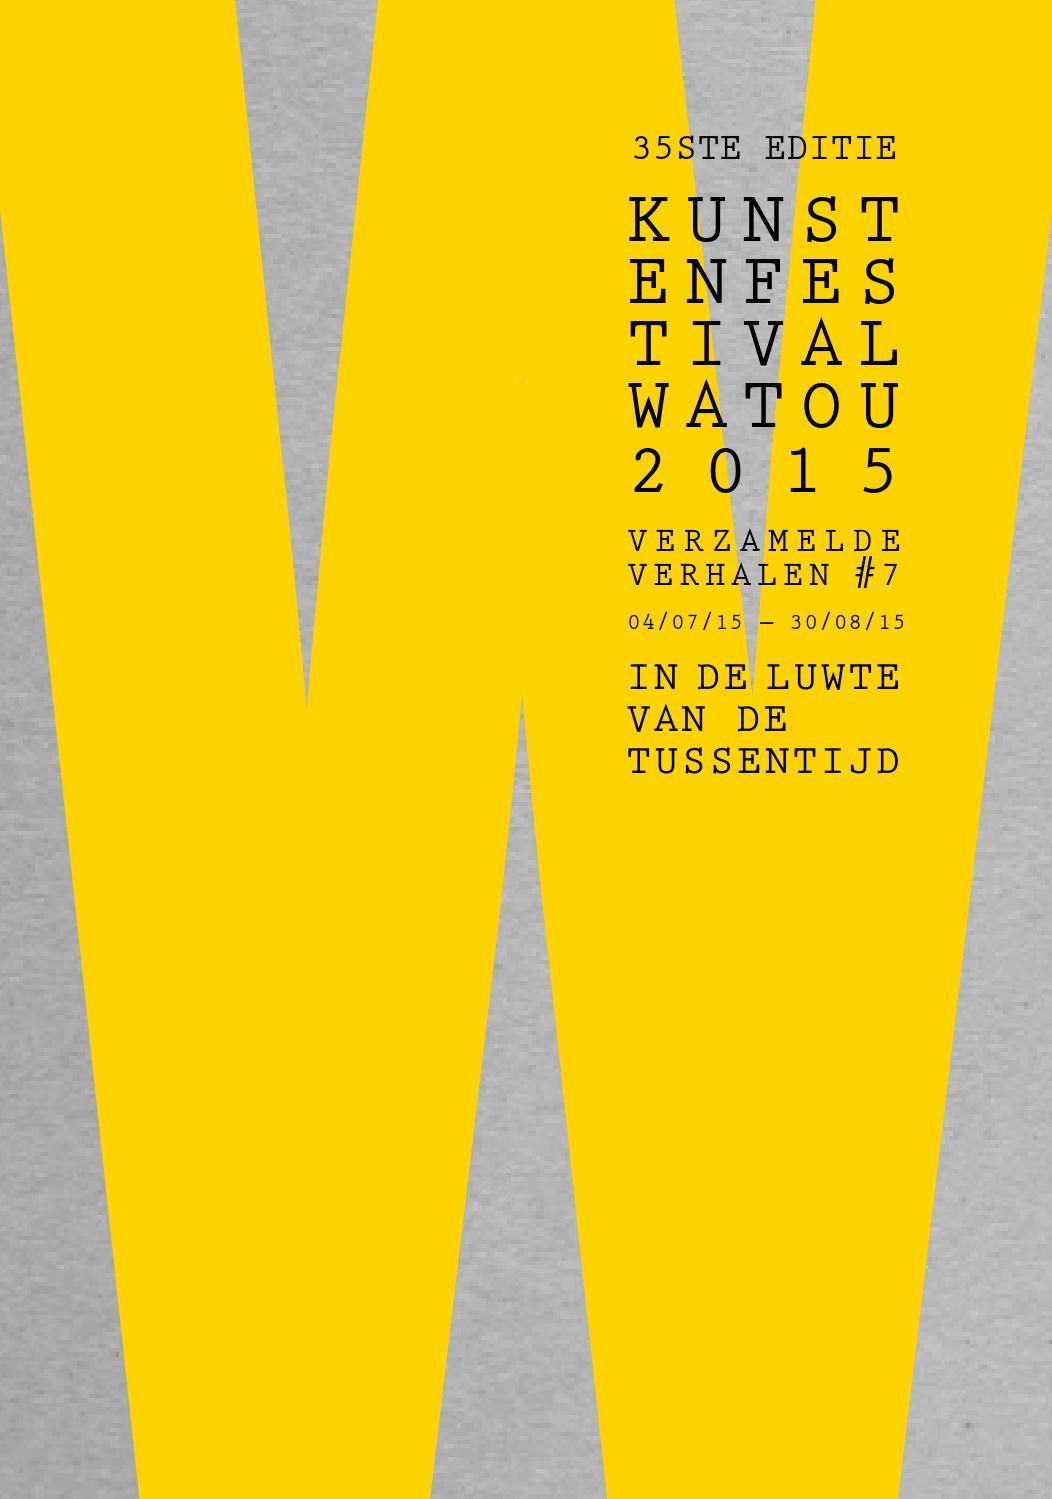 Kunstenfestival Watou 2015 By Vzwkunst Issuu